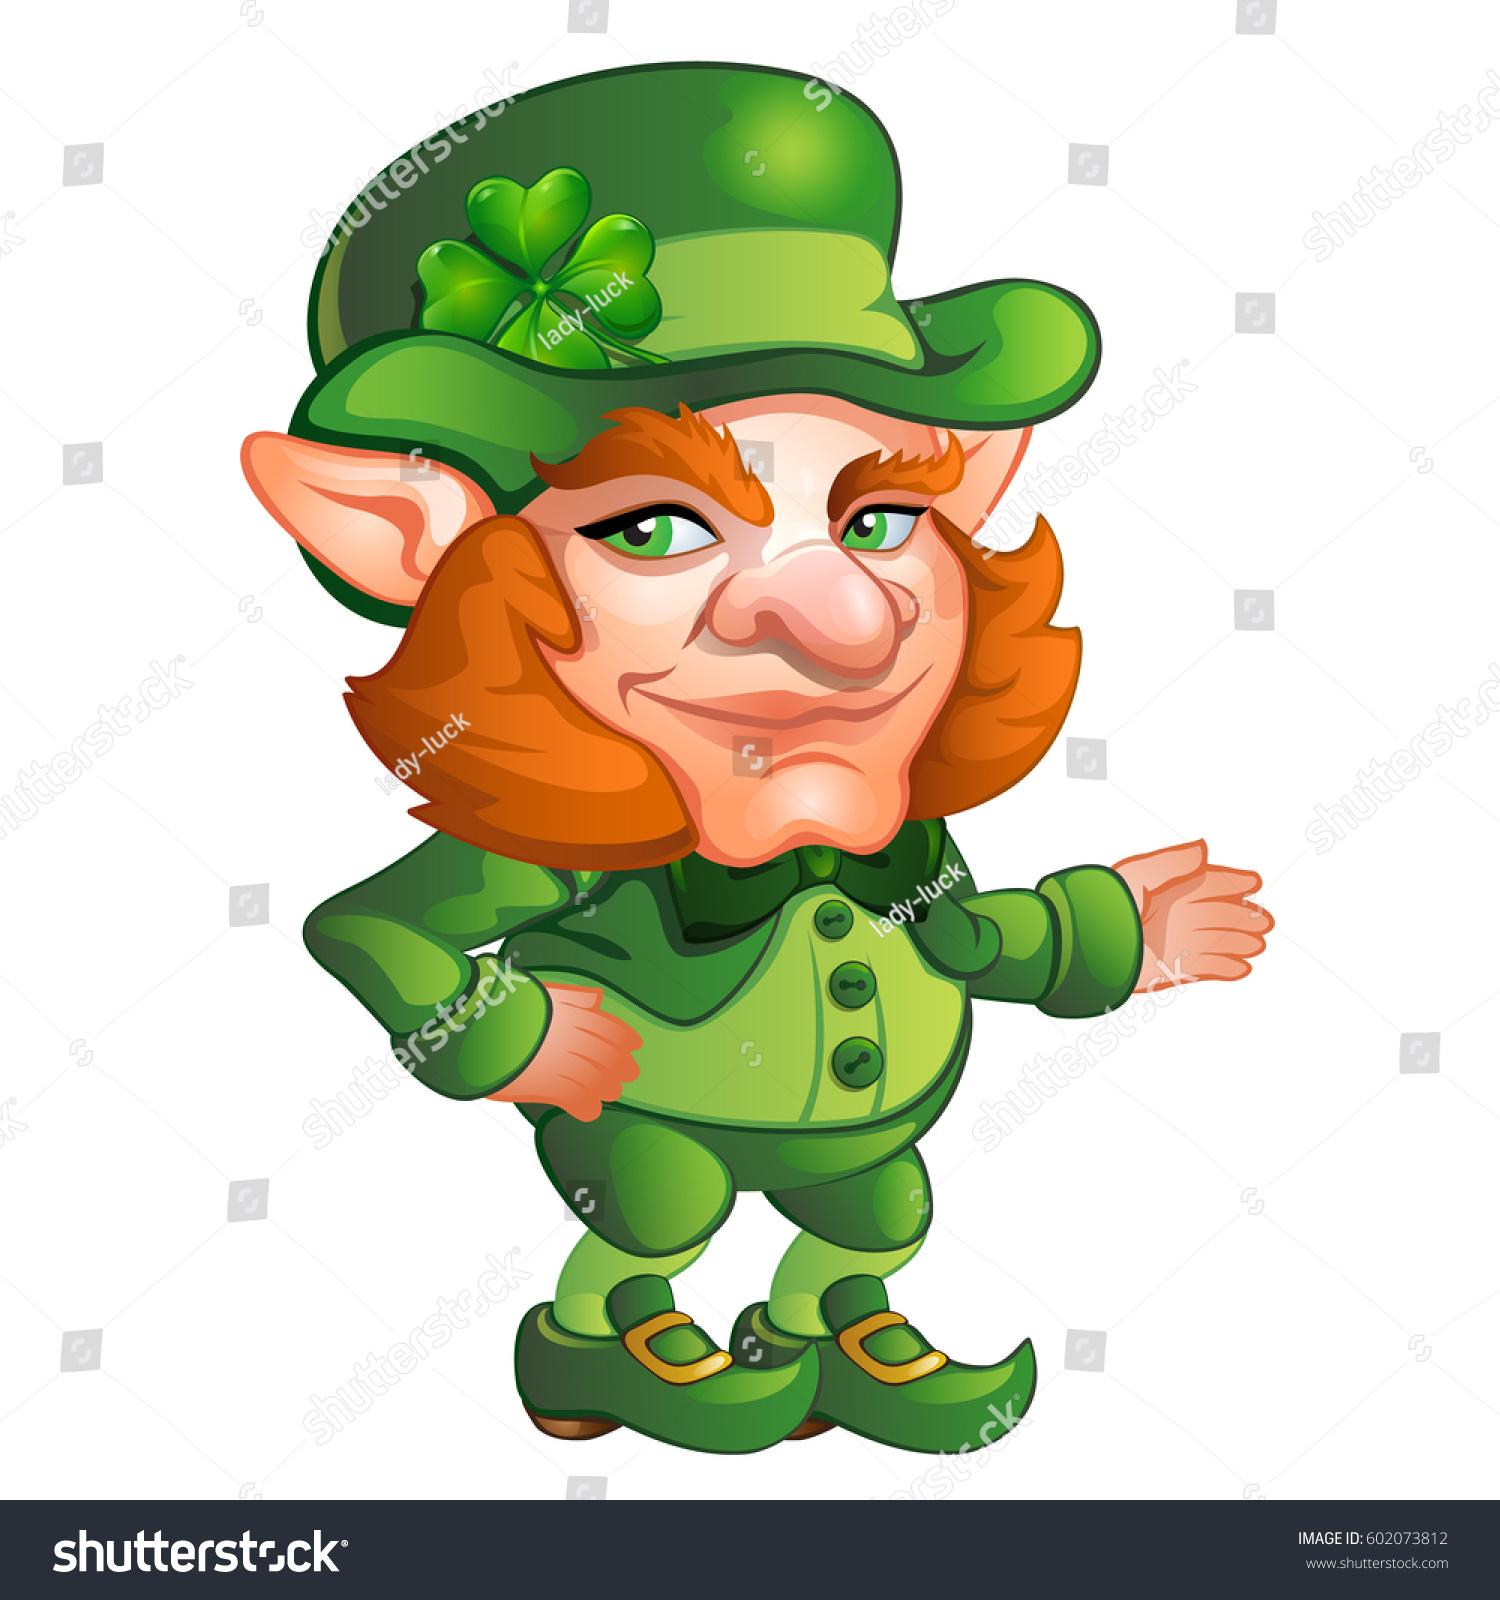 Uncategorized Animated Leprechaun cartoon animated old men leprechaun isolated stock vector on white background saint patricks day character with